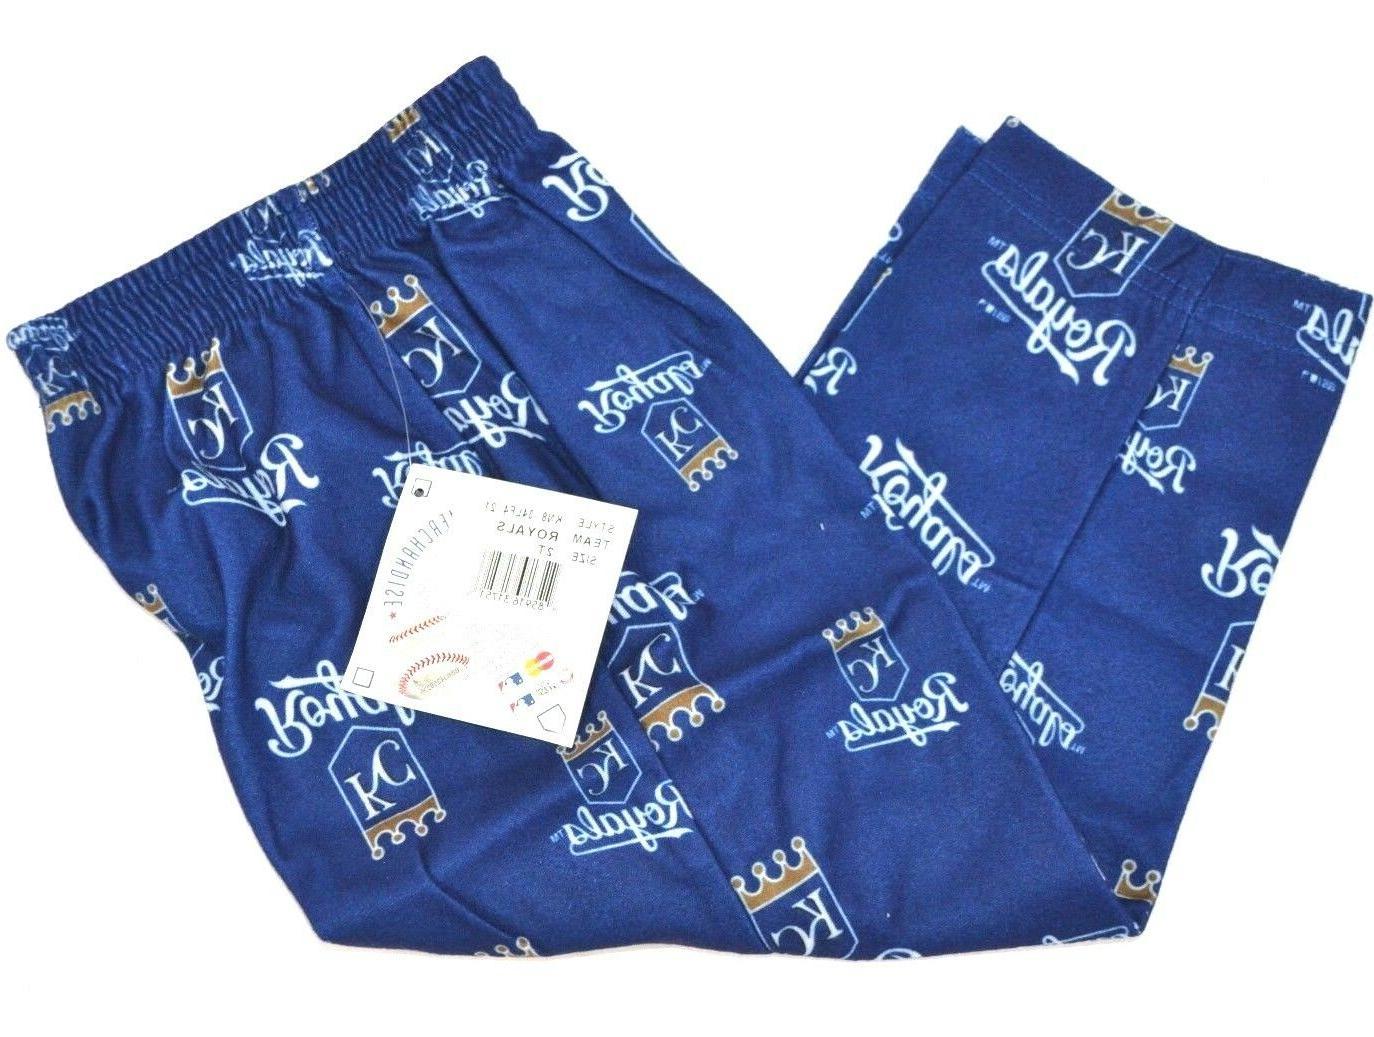 MLB Toddler Royals Sleepwear All Over Print Pant, 2T, Deep R